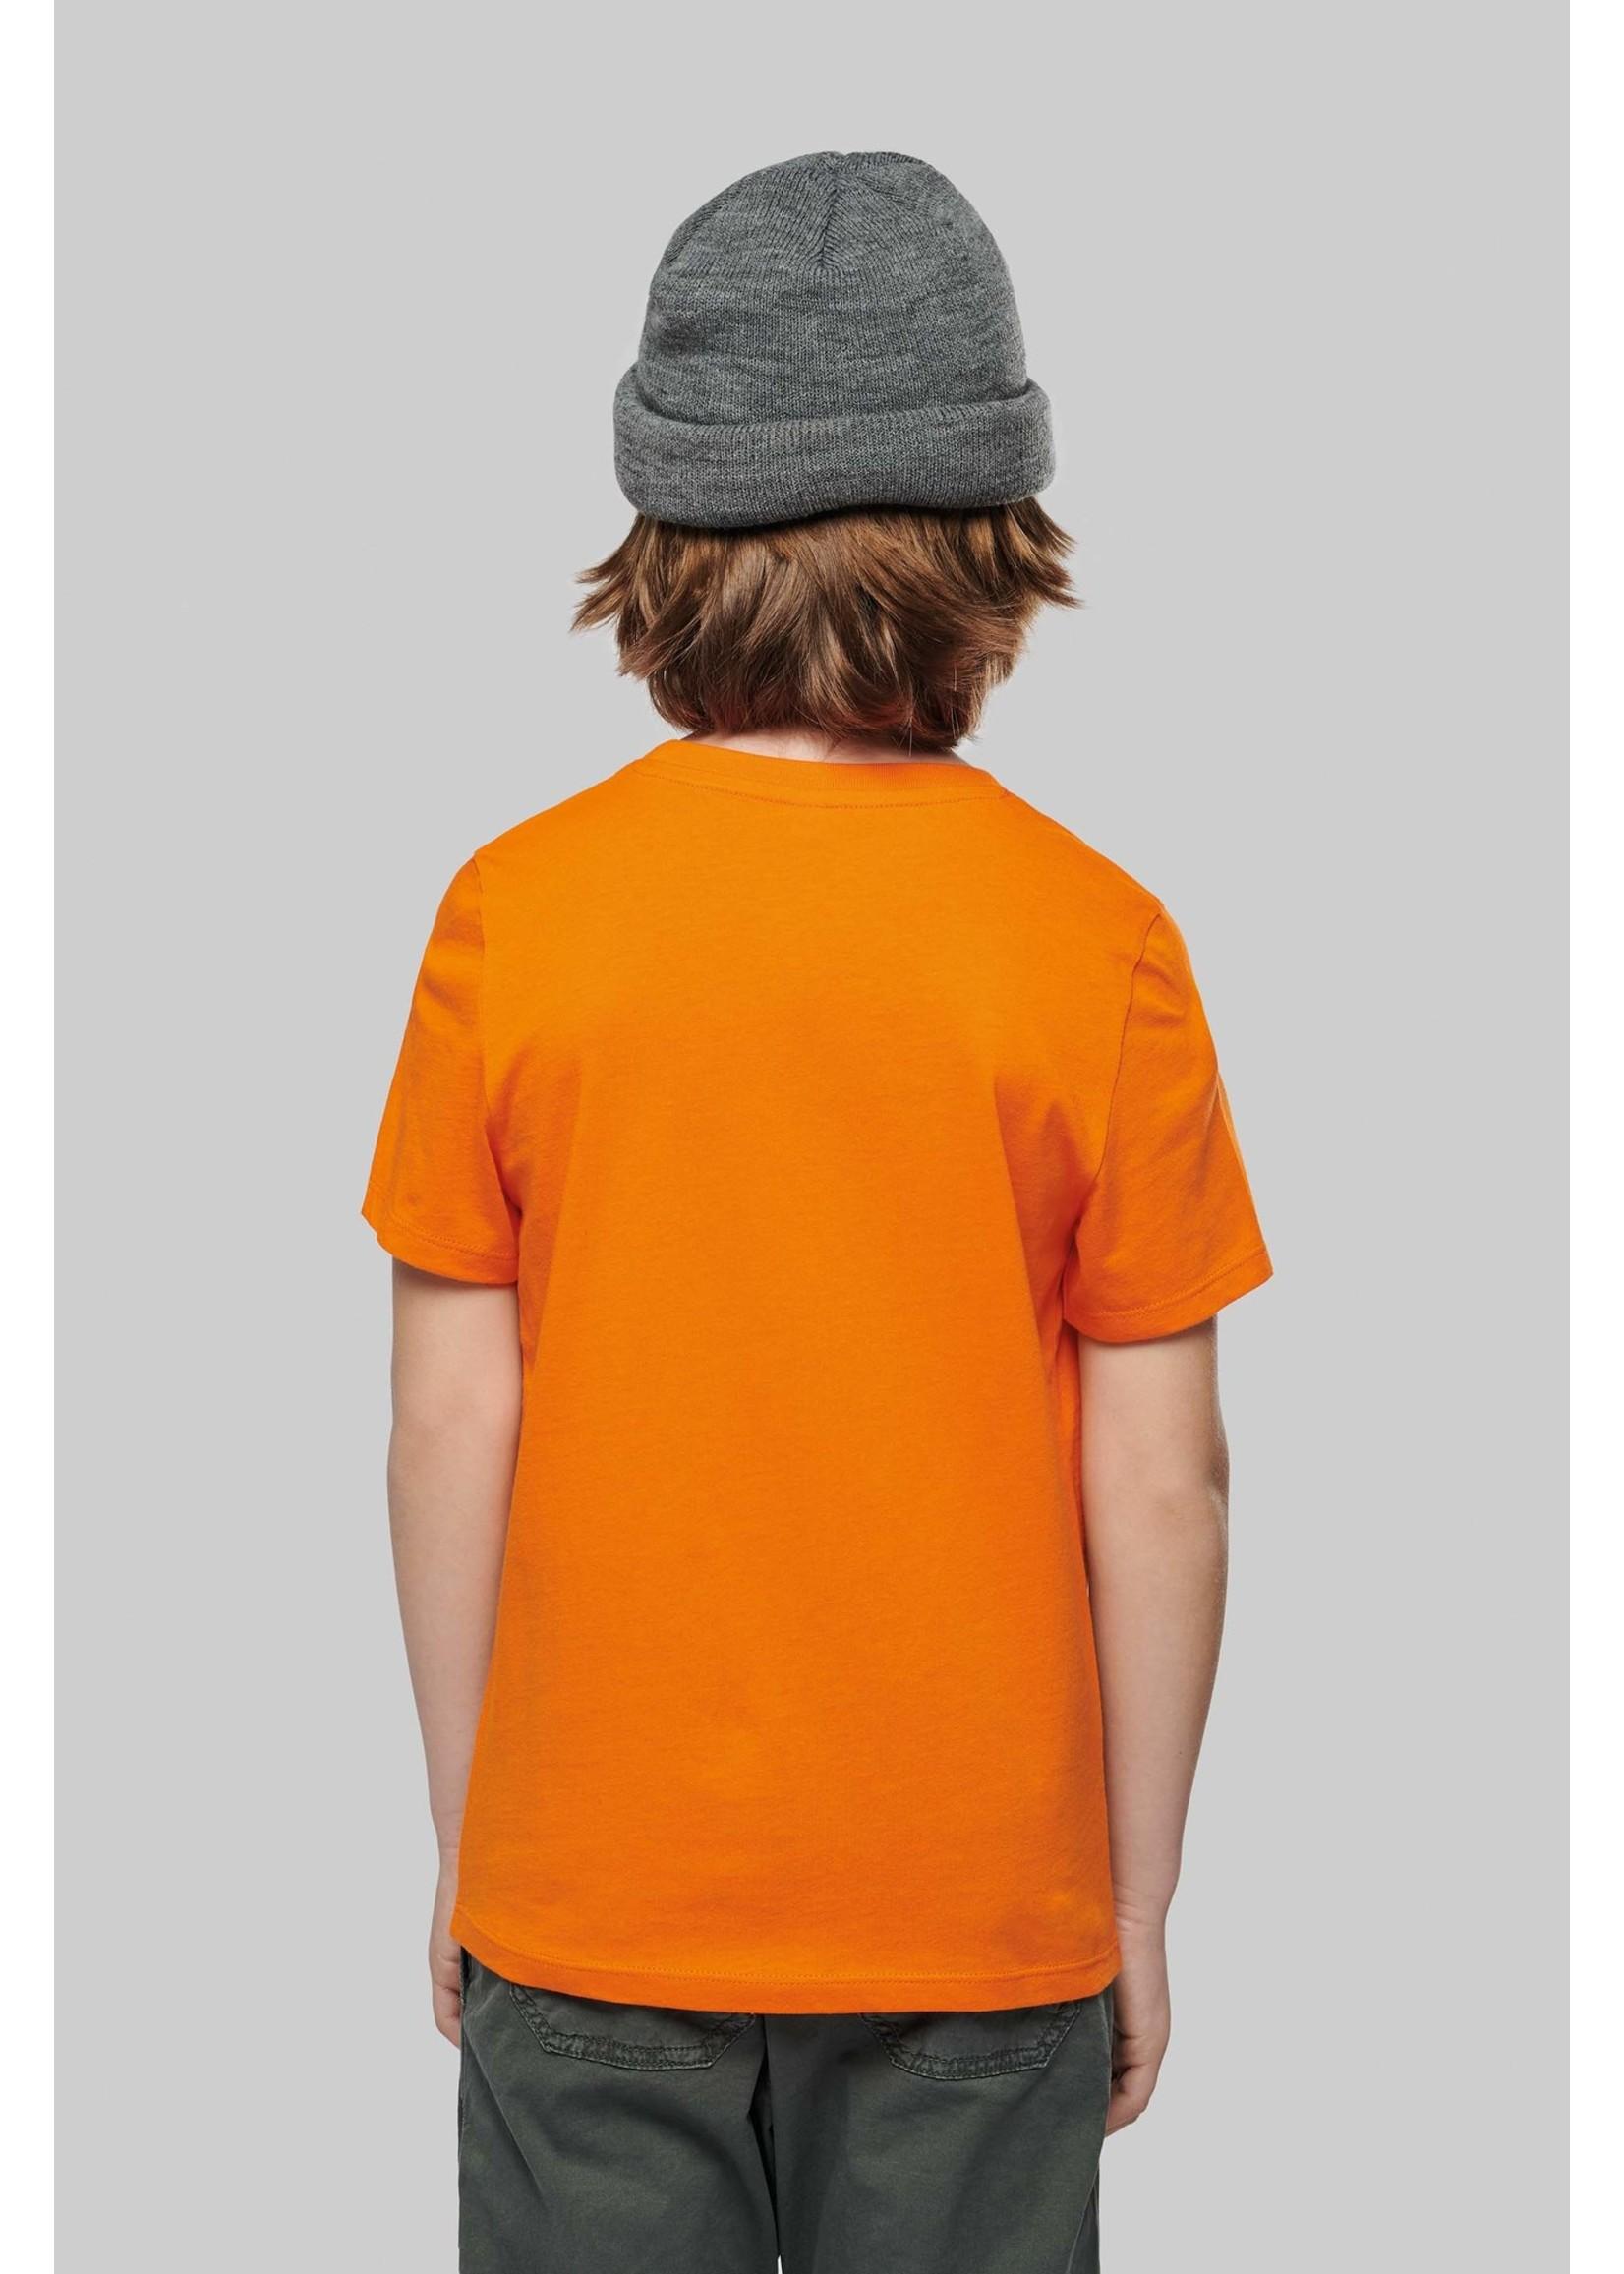 Eco-Friendly KIDS T-shirt - Kelly Green